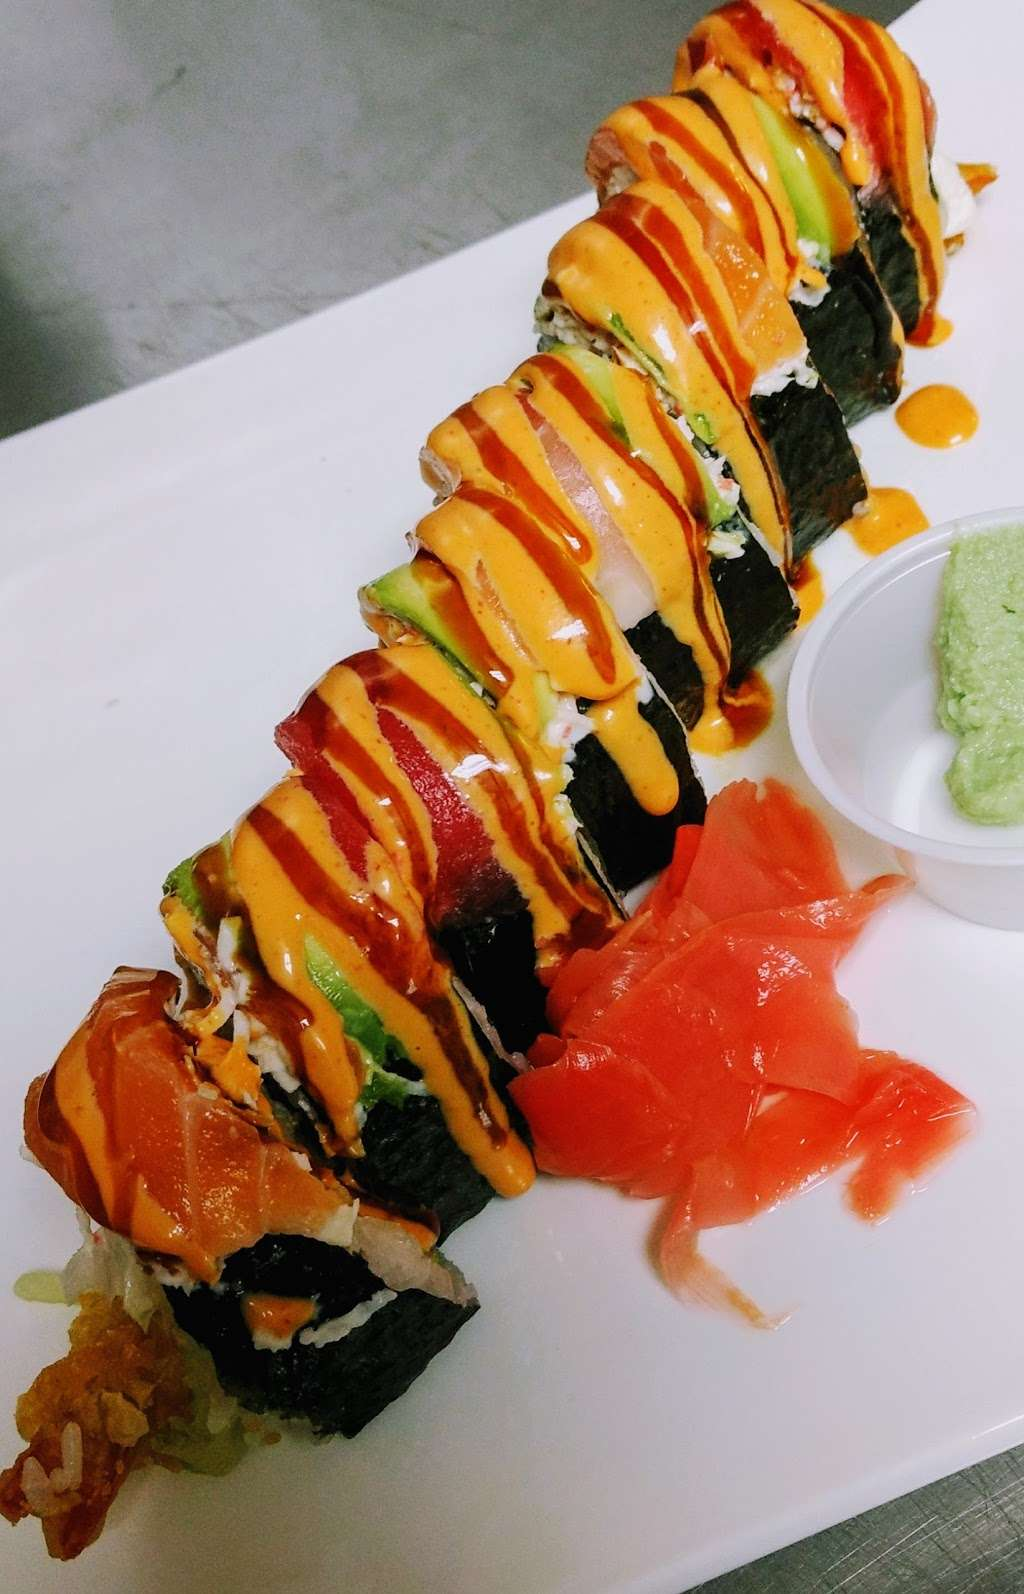 Sushi Station Revolving Sushi Bar 2223 Louisiana St Lawrence Ks 66046 Usa Lawrence, kansas by josh ritter. sushi station revolving sushi bar 2223